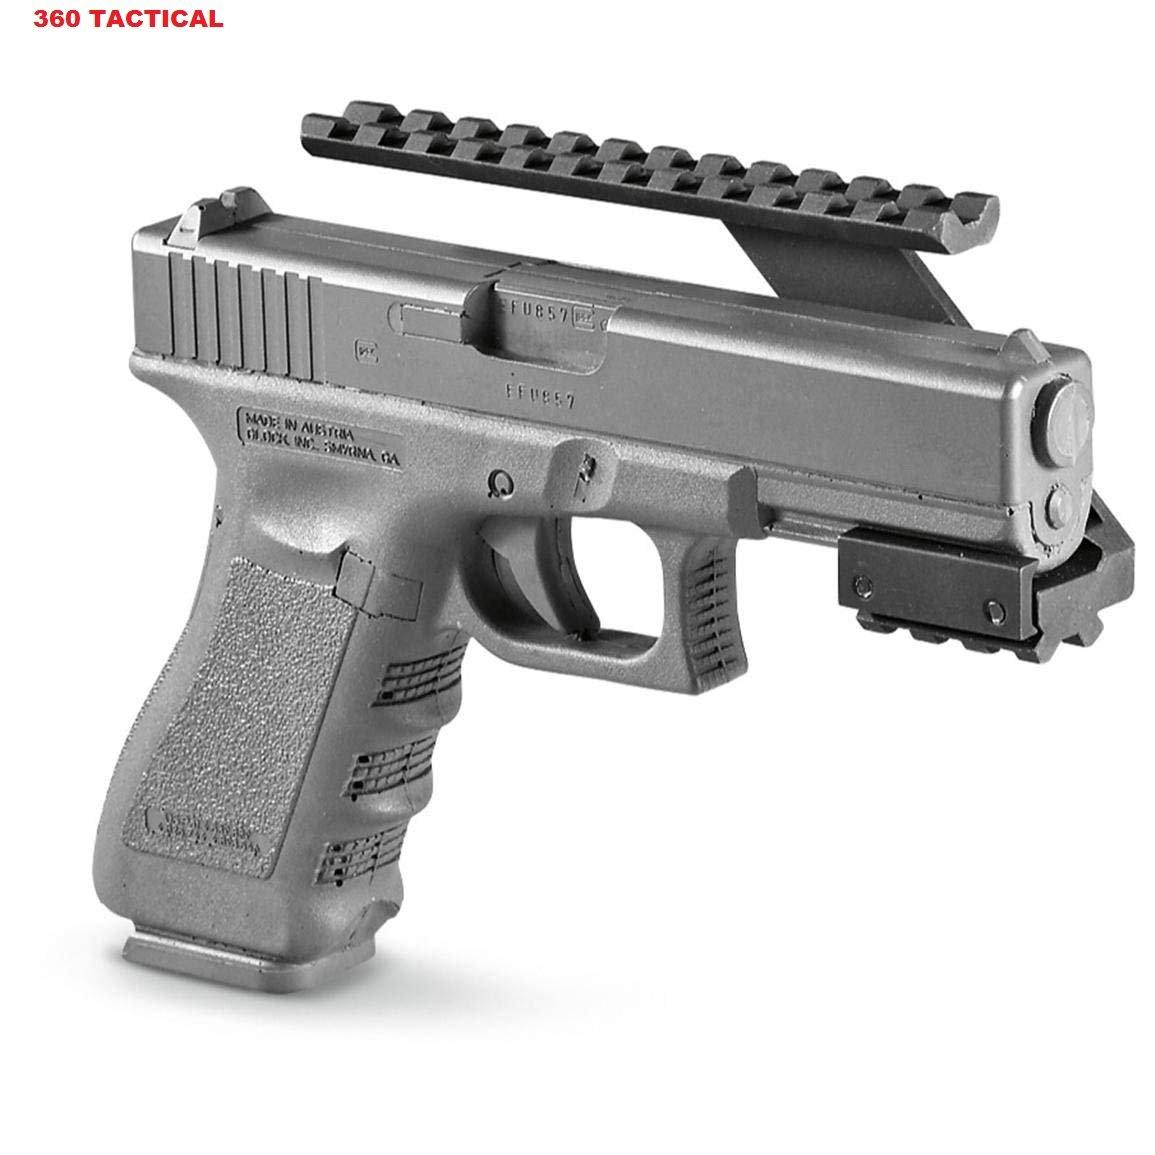 360 Tactical Pistol Rail Front Machined Aluminum No Gunsmithing Weaver Picatinny Top & Bottom Rail Pistol Handgun Scope Mount for Sights, Lasers, Lights & Accessories Pistol Front Rail